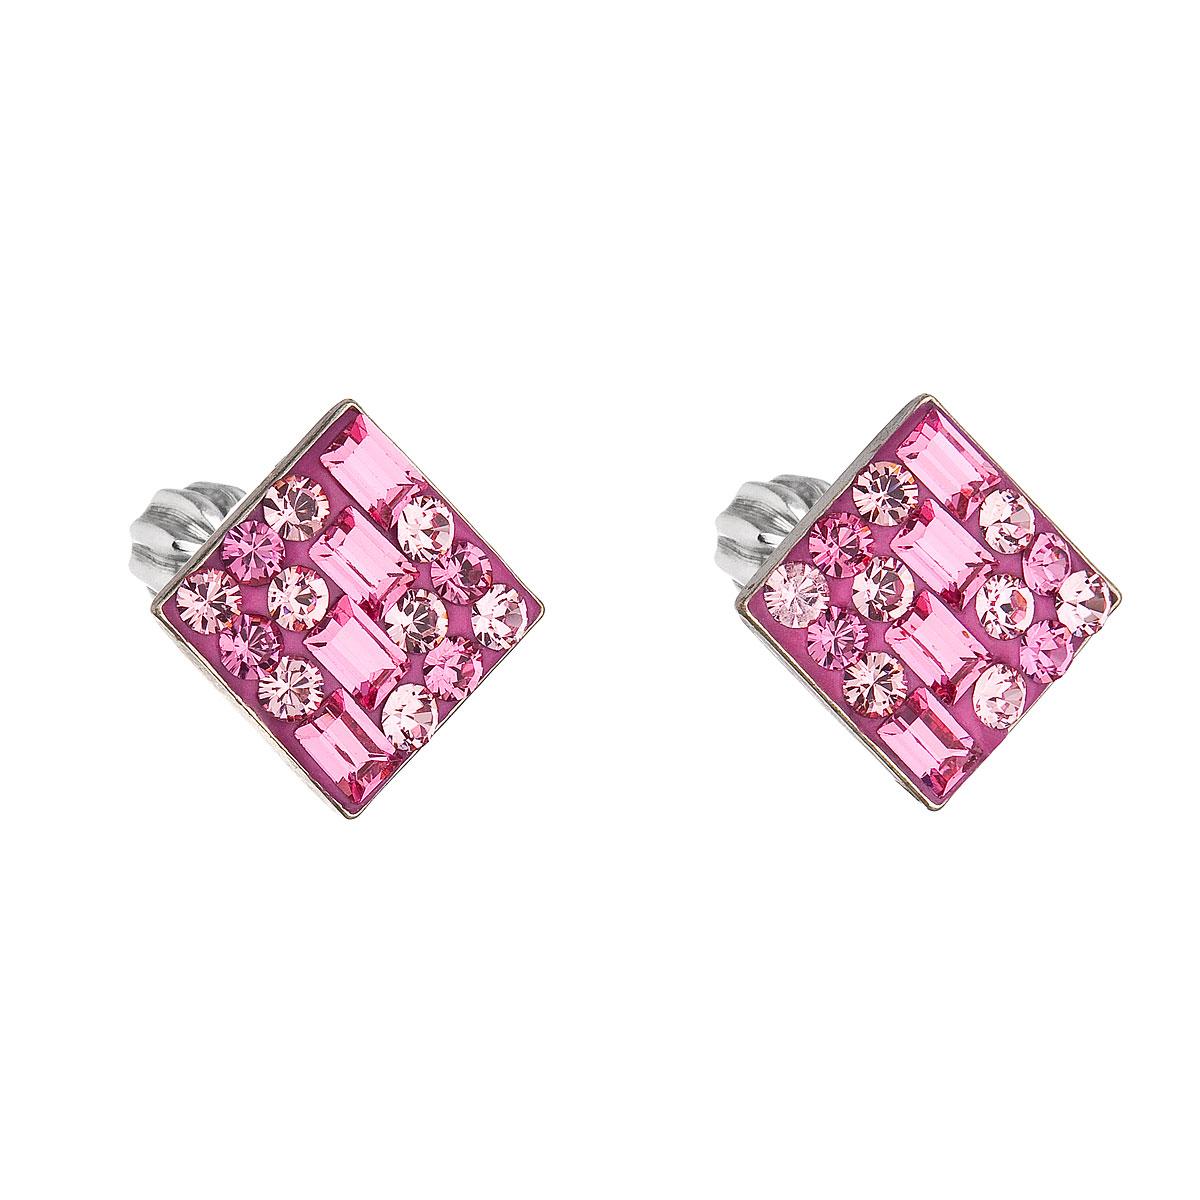 Stříbrné náušnice pecka s krystaly Swarovski růžový kosočtverec 31169.3 rose